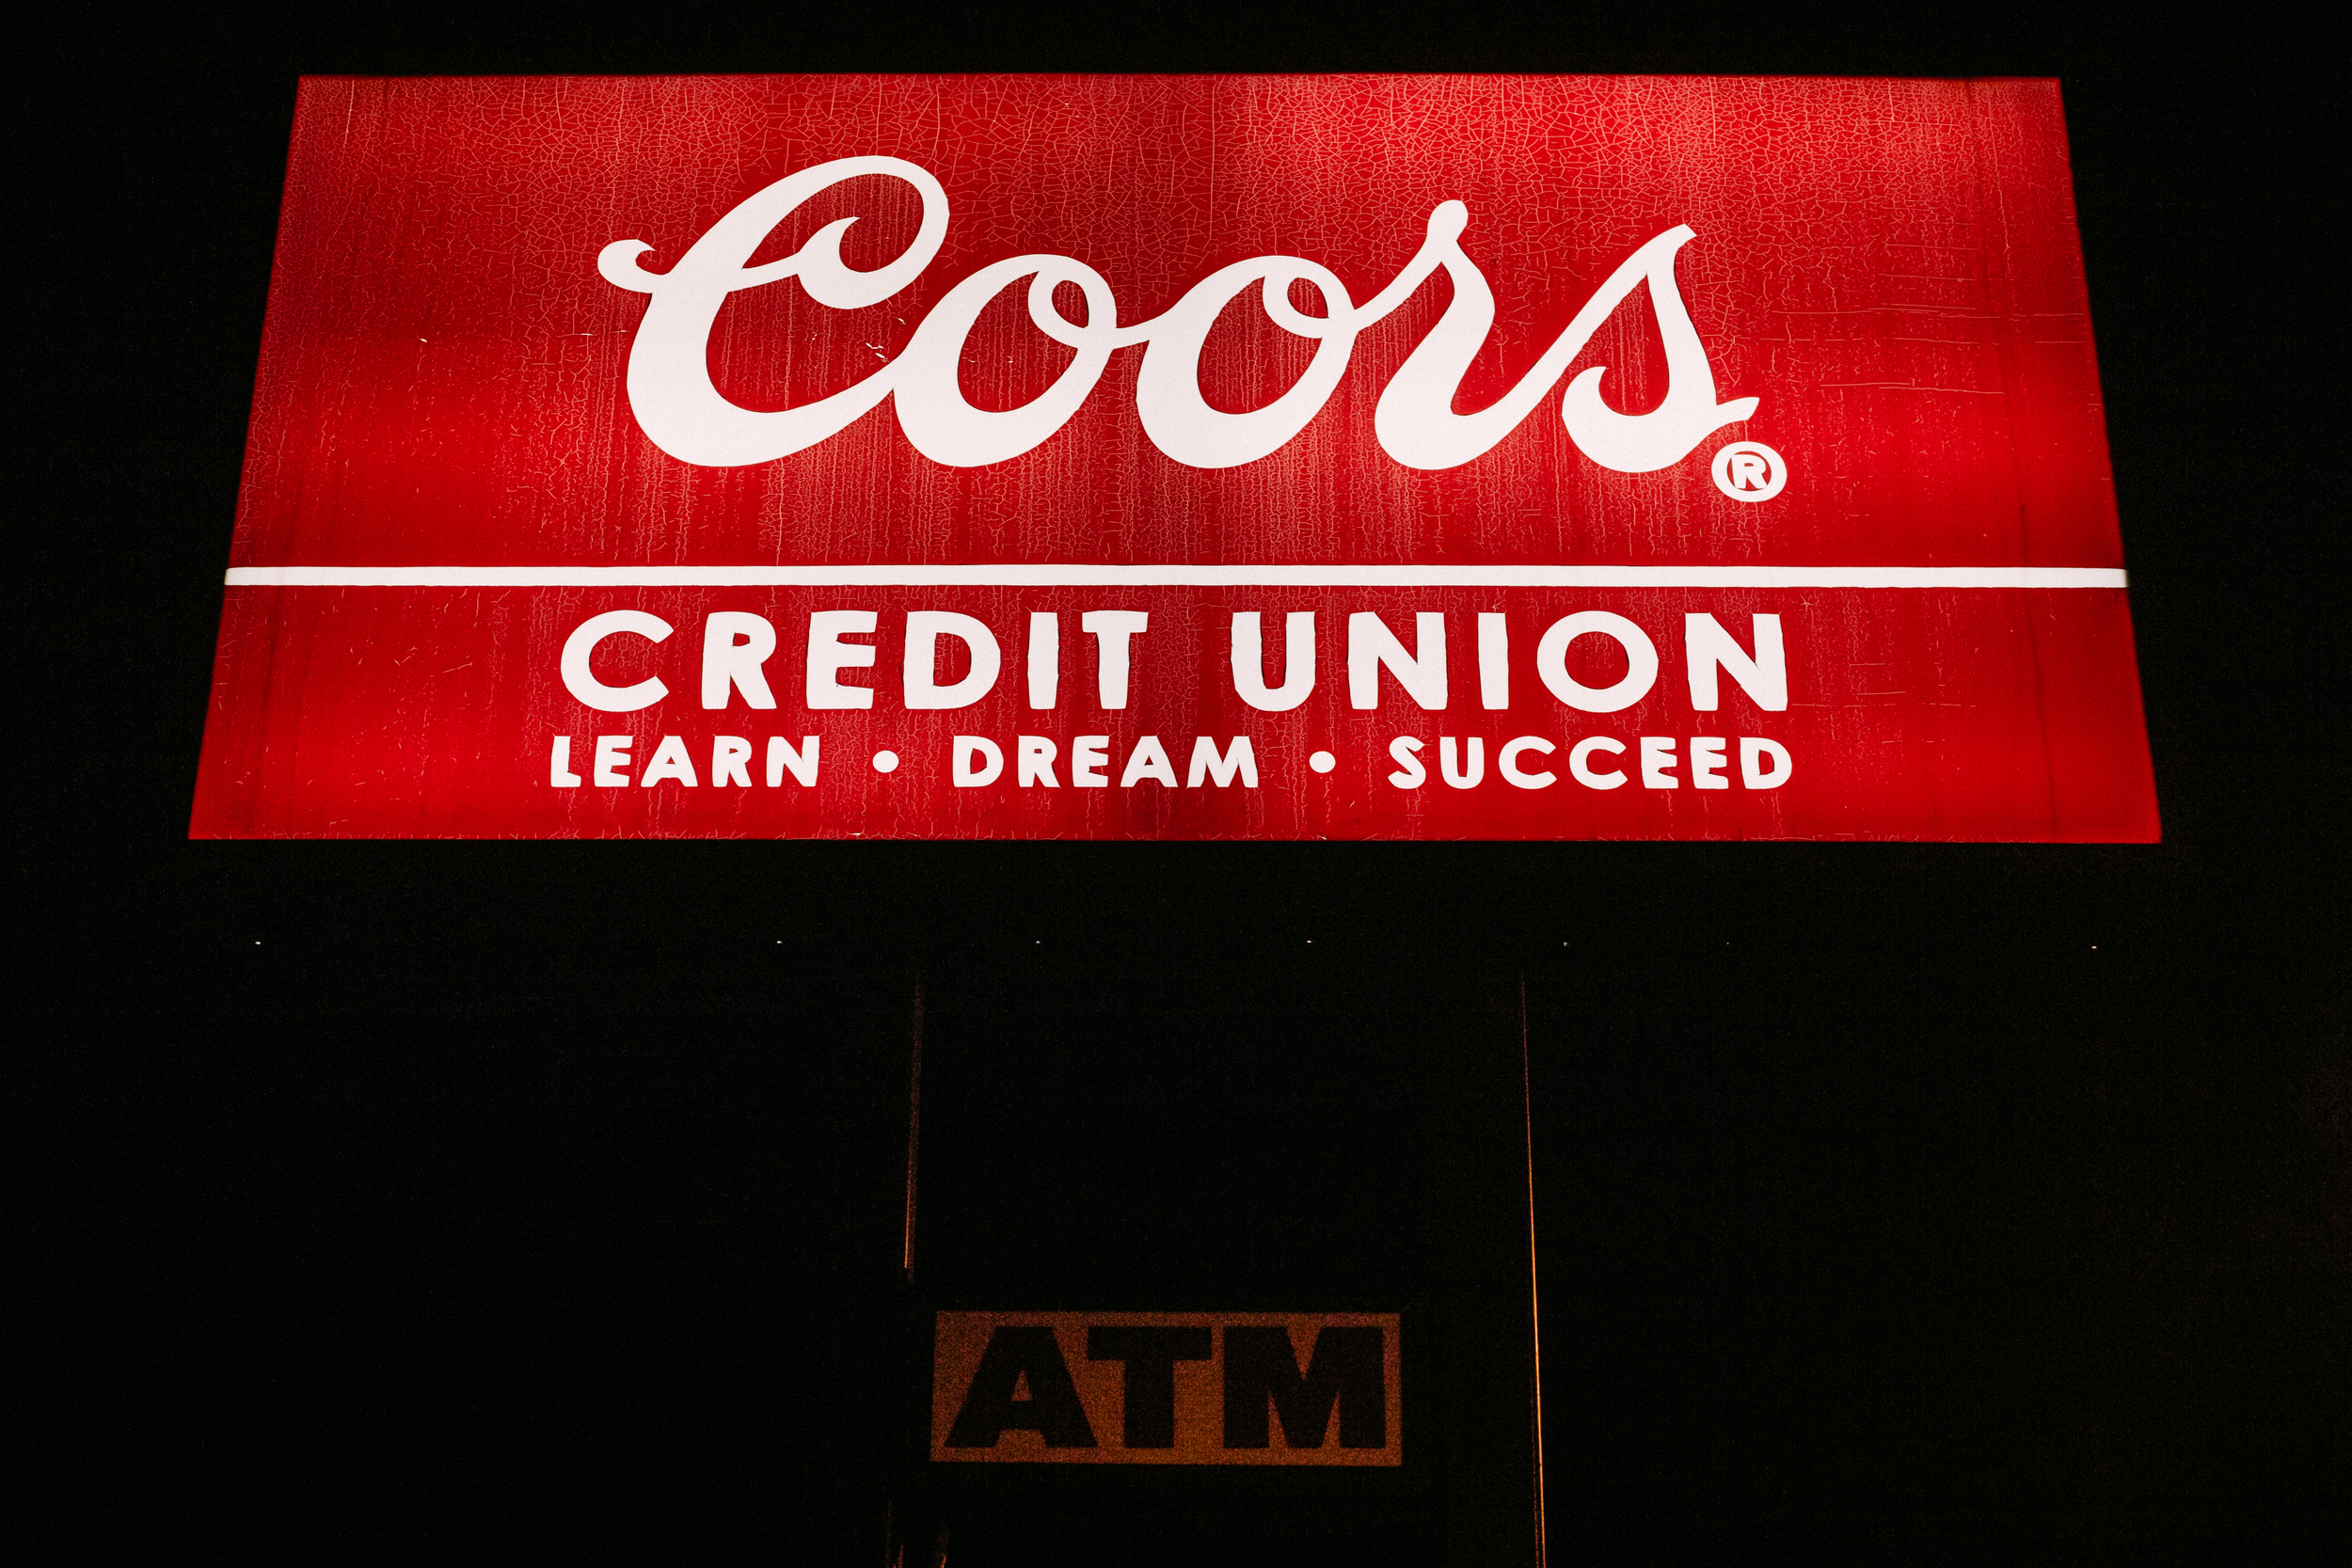 Coors Credit Union.jpg